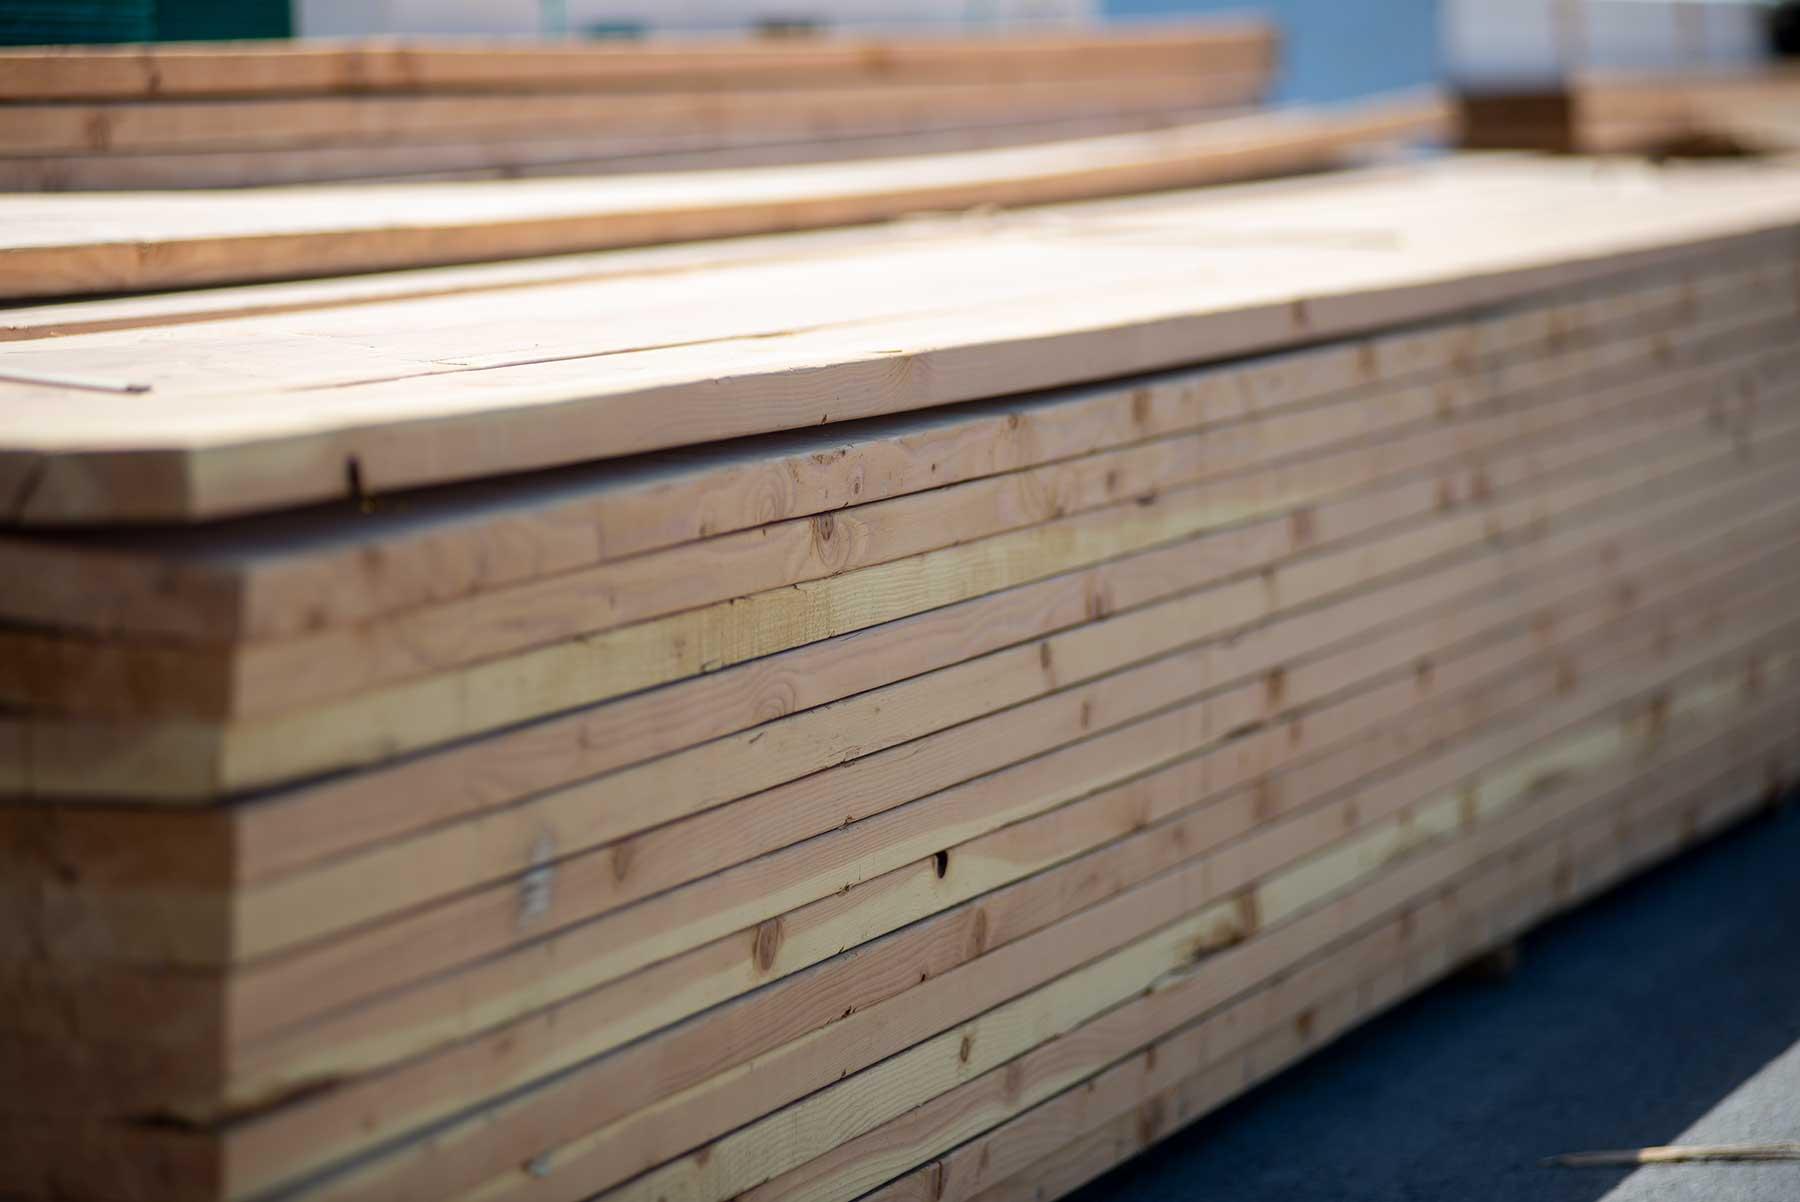 lumber 2x6 studs